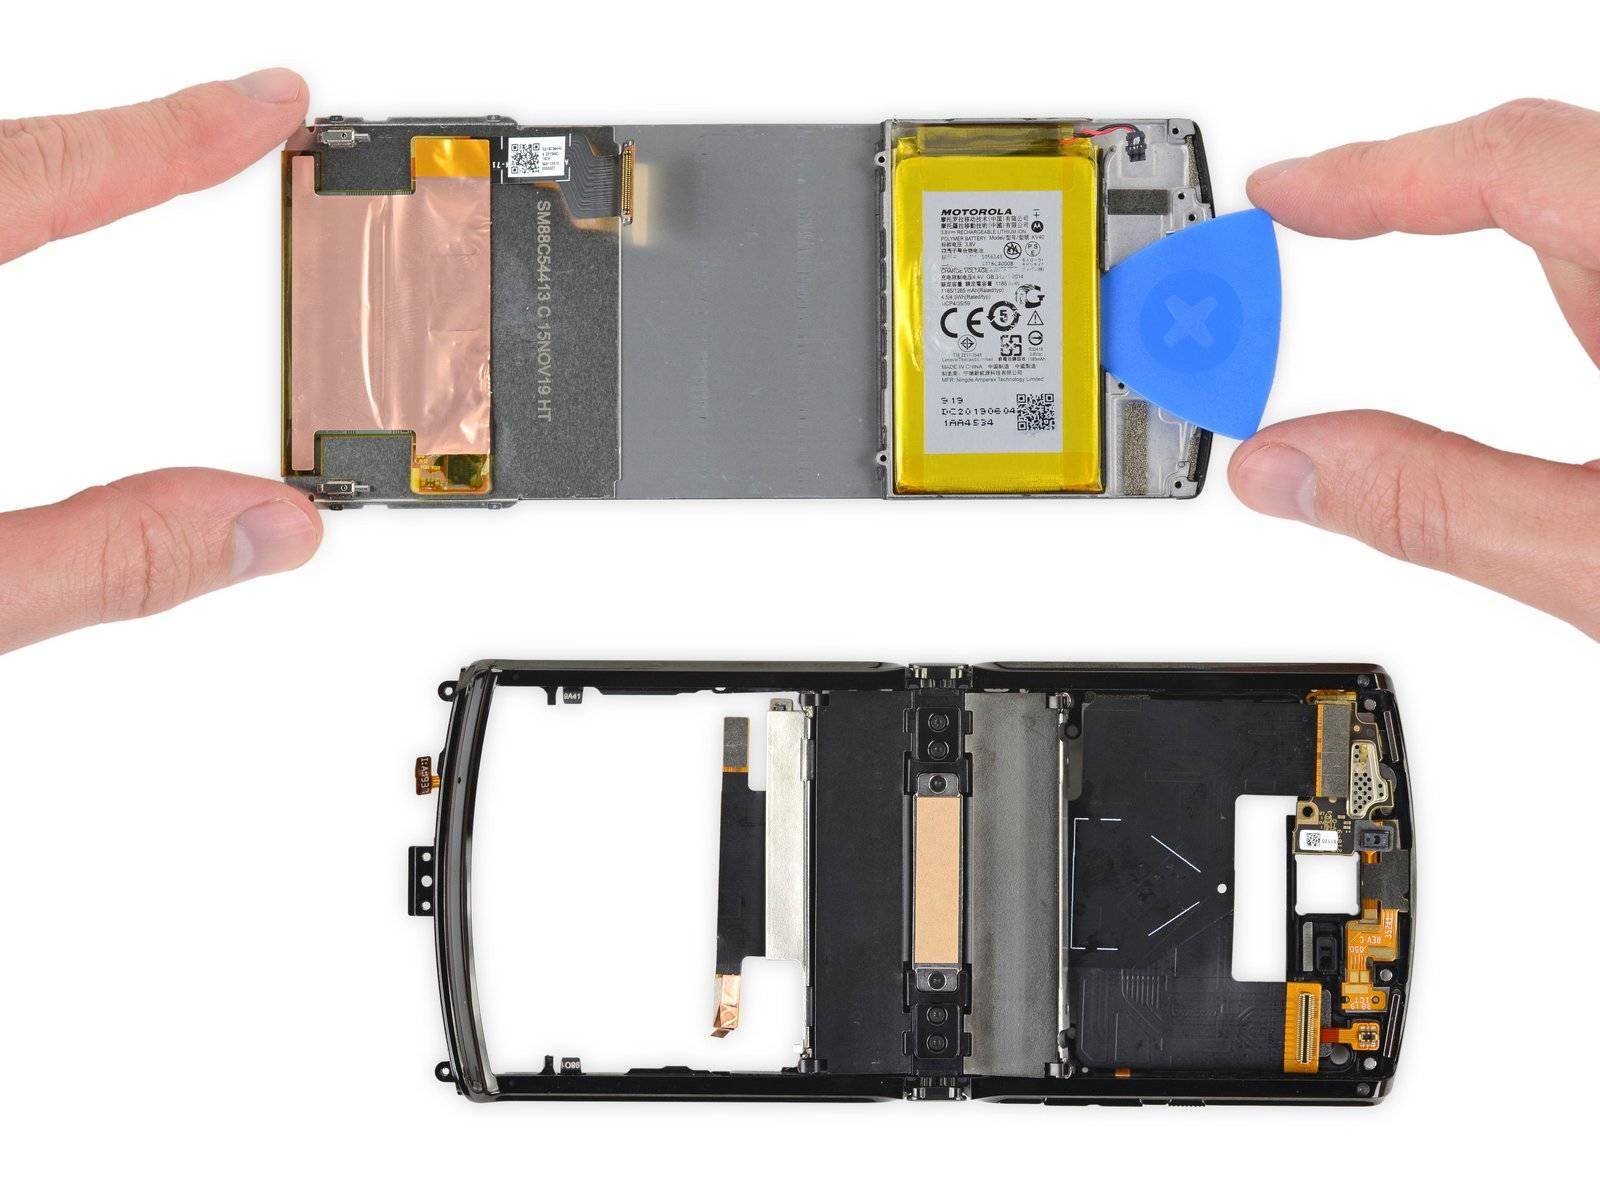 Motorola Razr teardown finds it practically impossible to fix